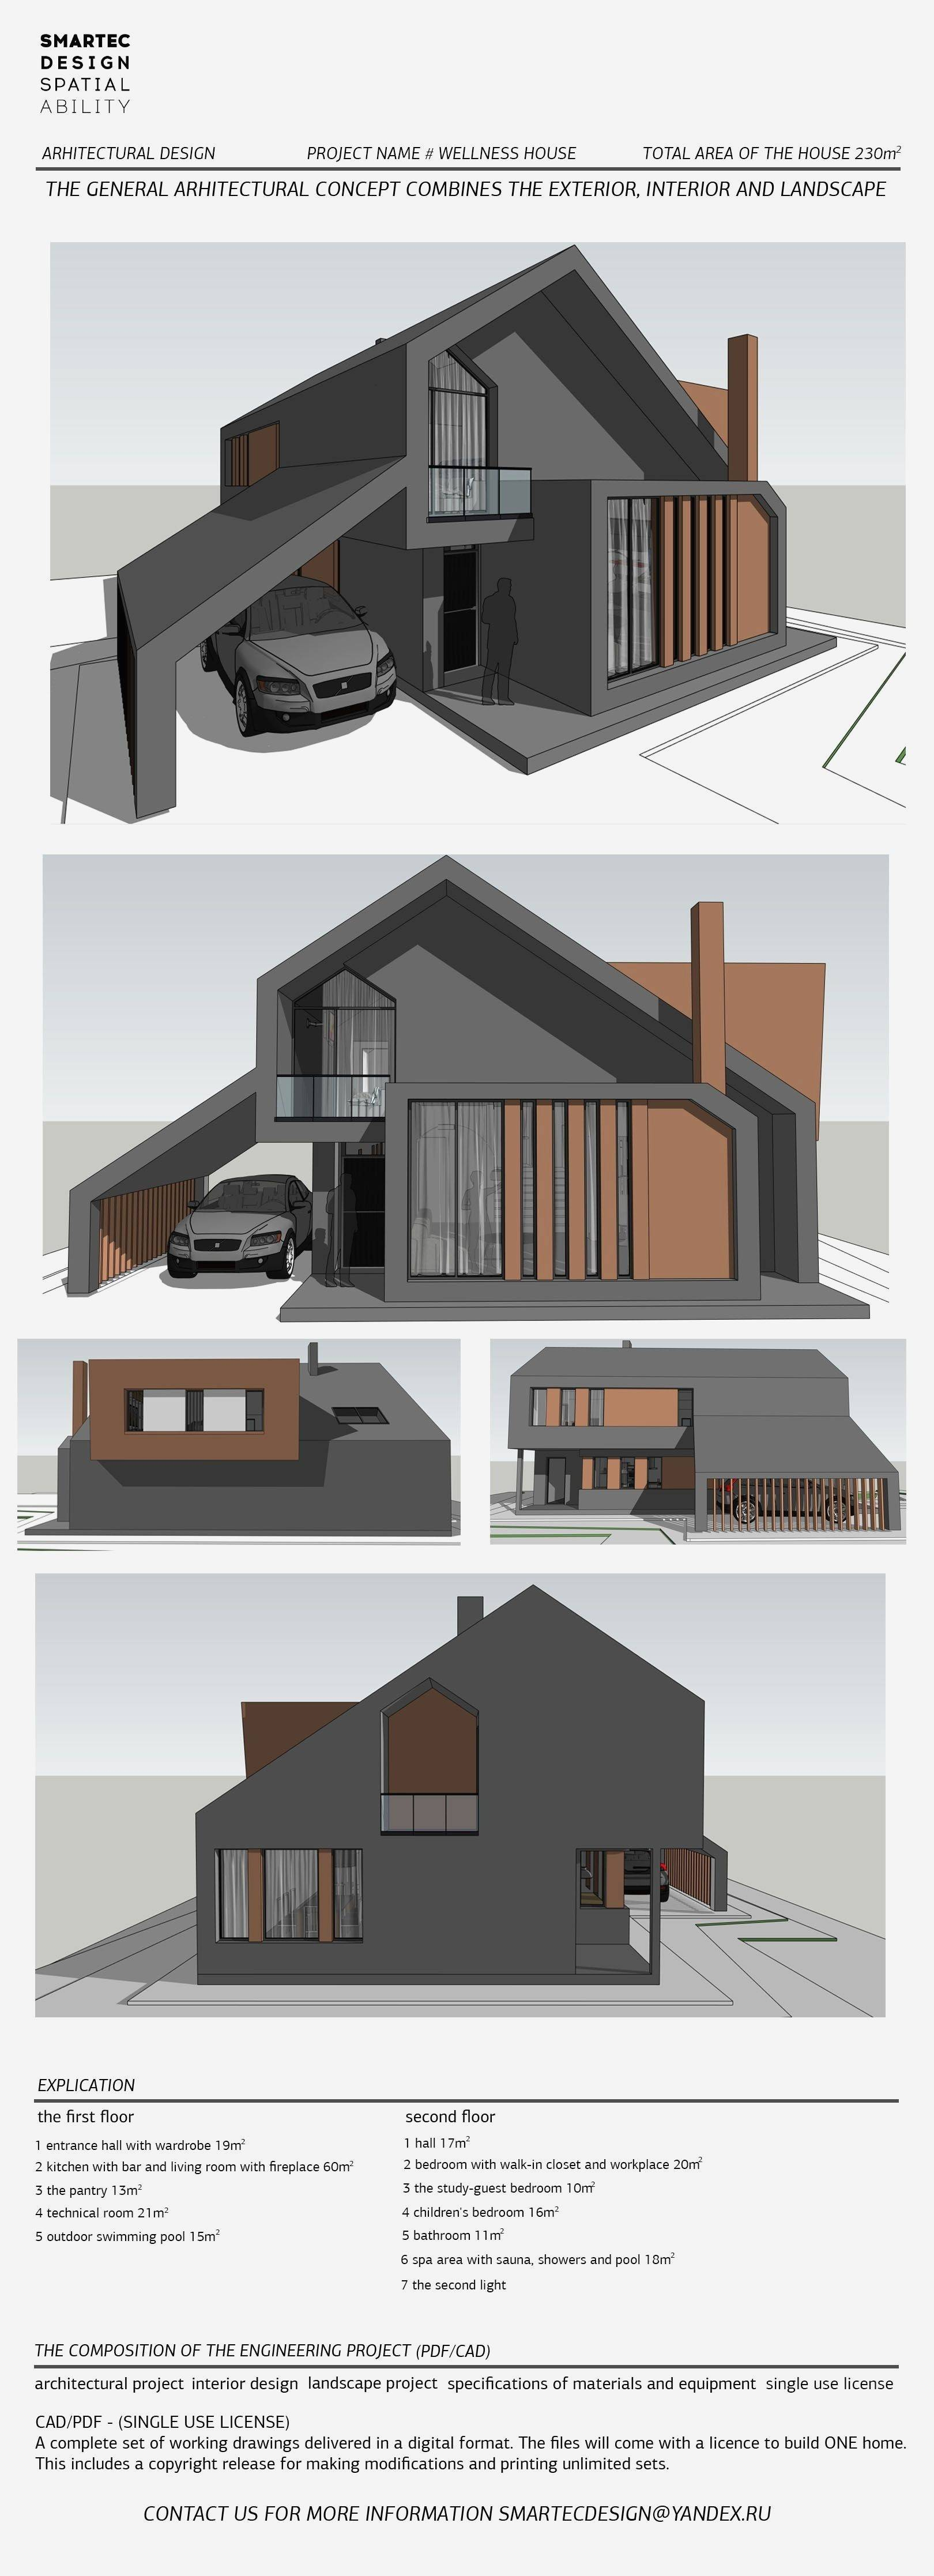 3d home interior images 3d house interior best 3d interior design fresh kitchen joys kitchen joys kitchen 0d